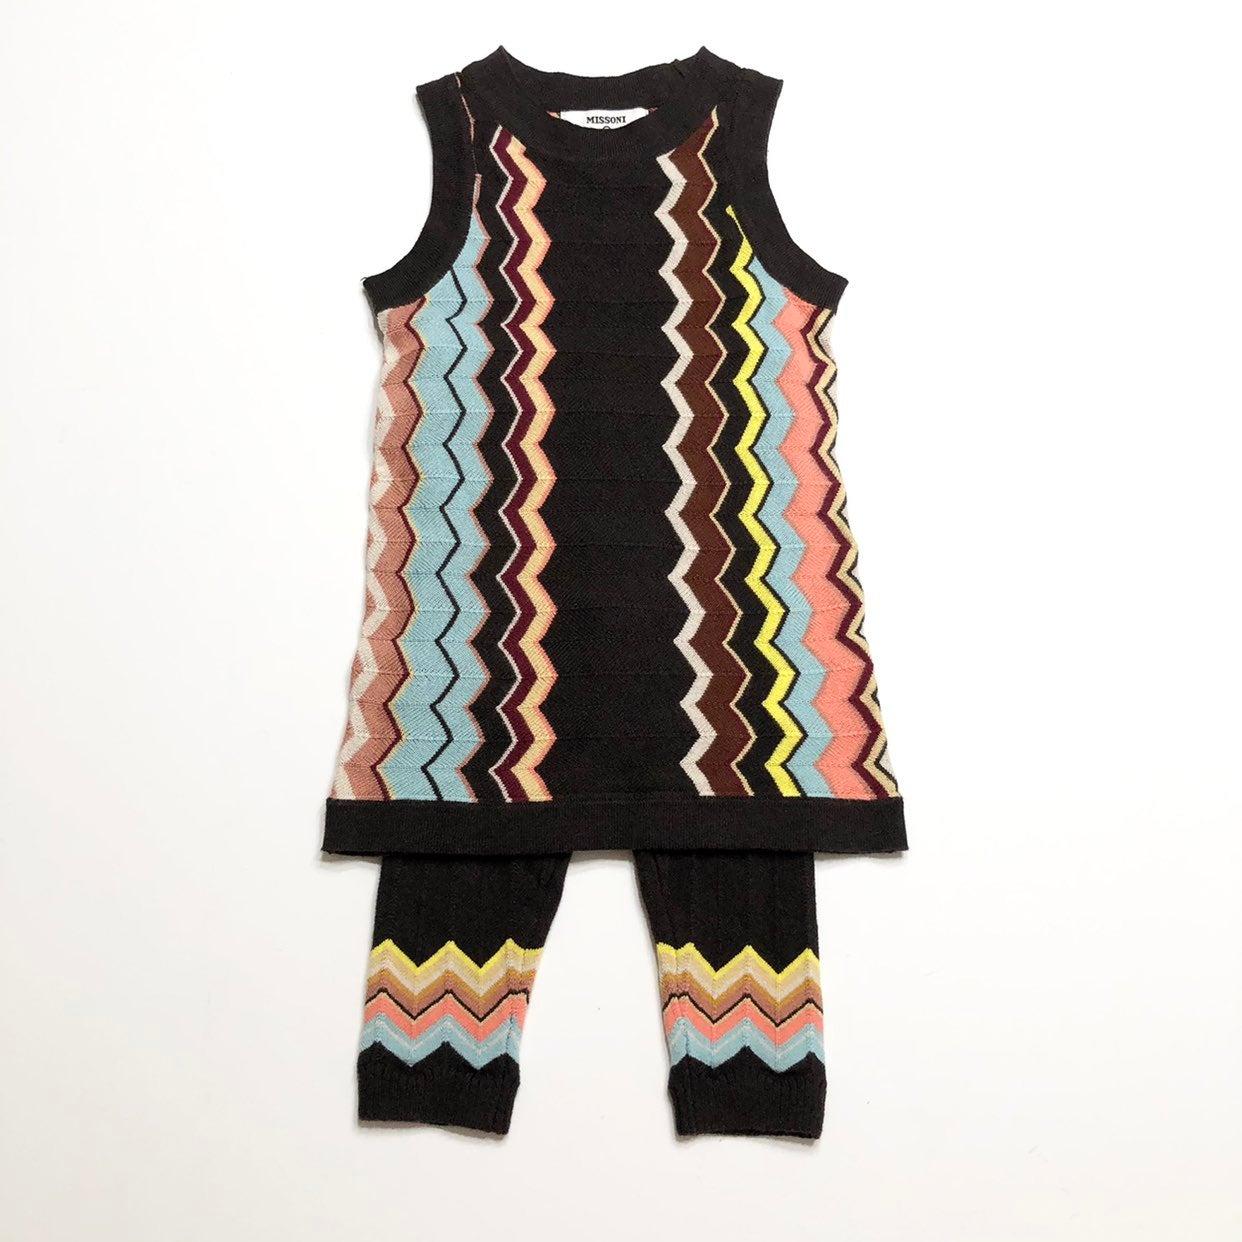 Missoni Infant Toddler Girls Chevron Stripe Zig Zag Sweater Pants NWT Free Ship